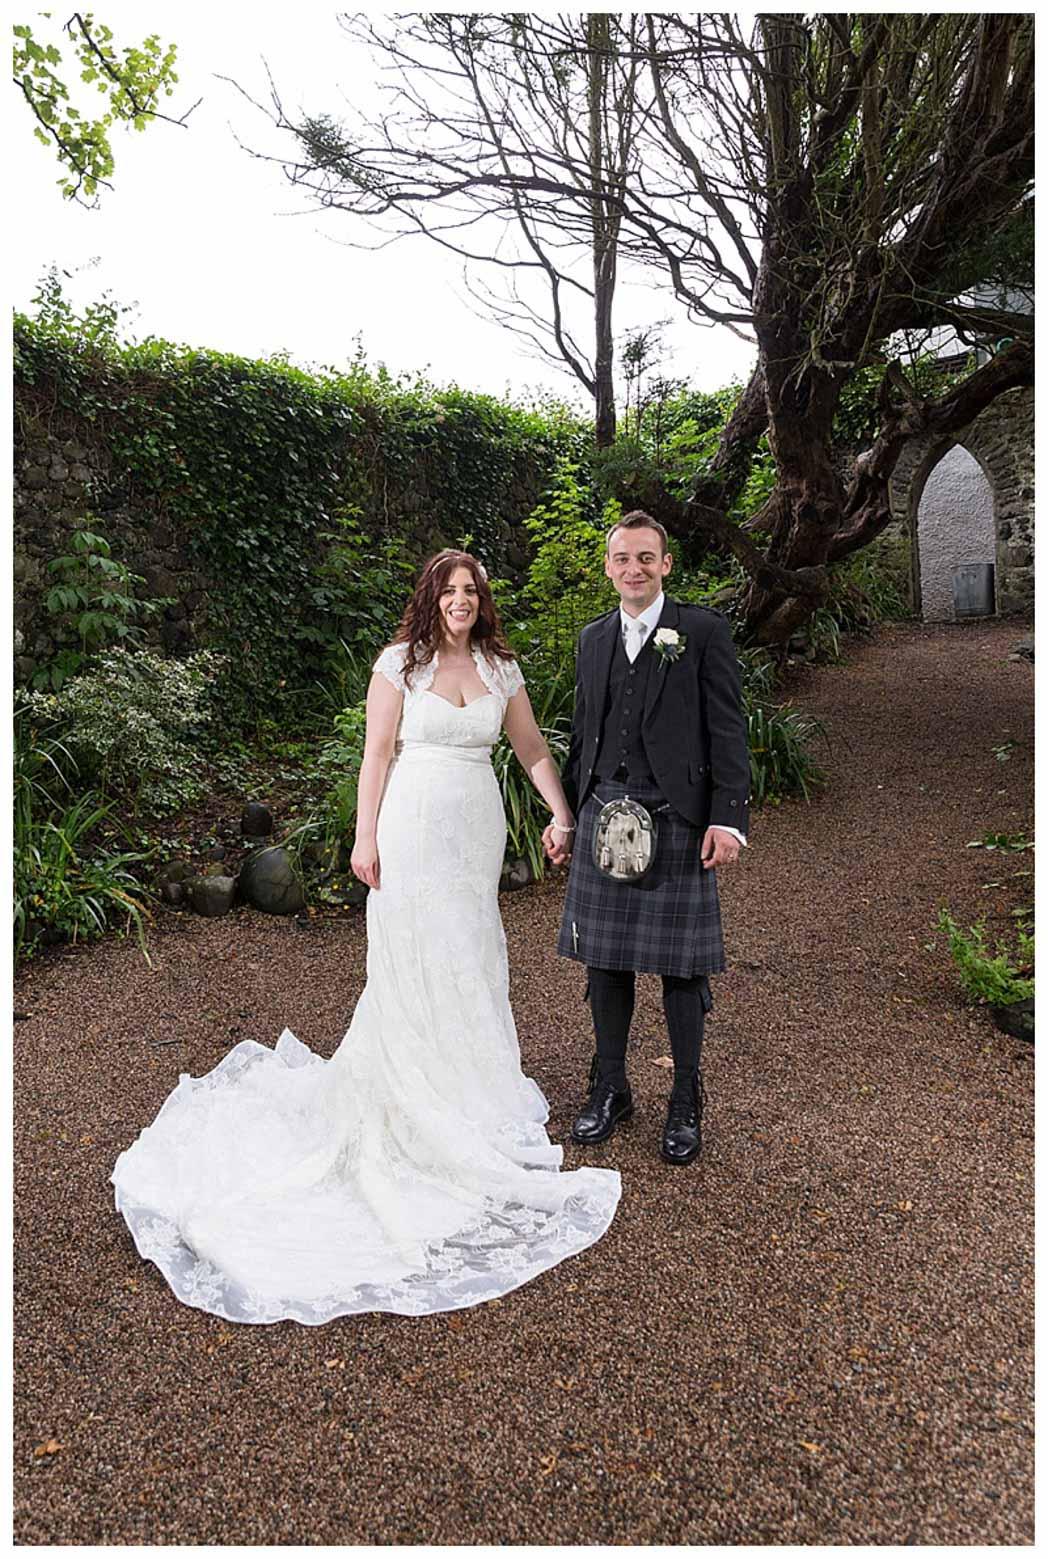 Ballygally Castle Wedding Photographs by Ricky Parker Photography-43